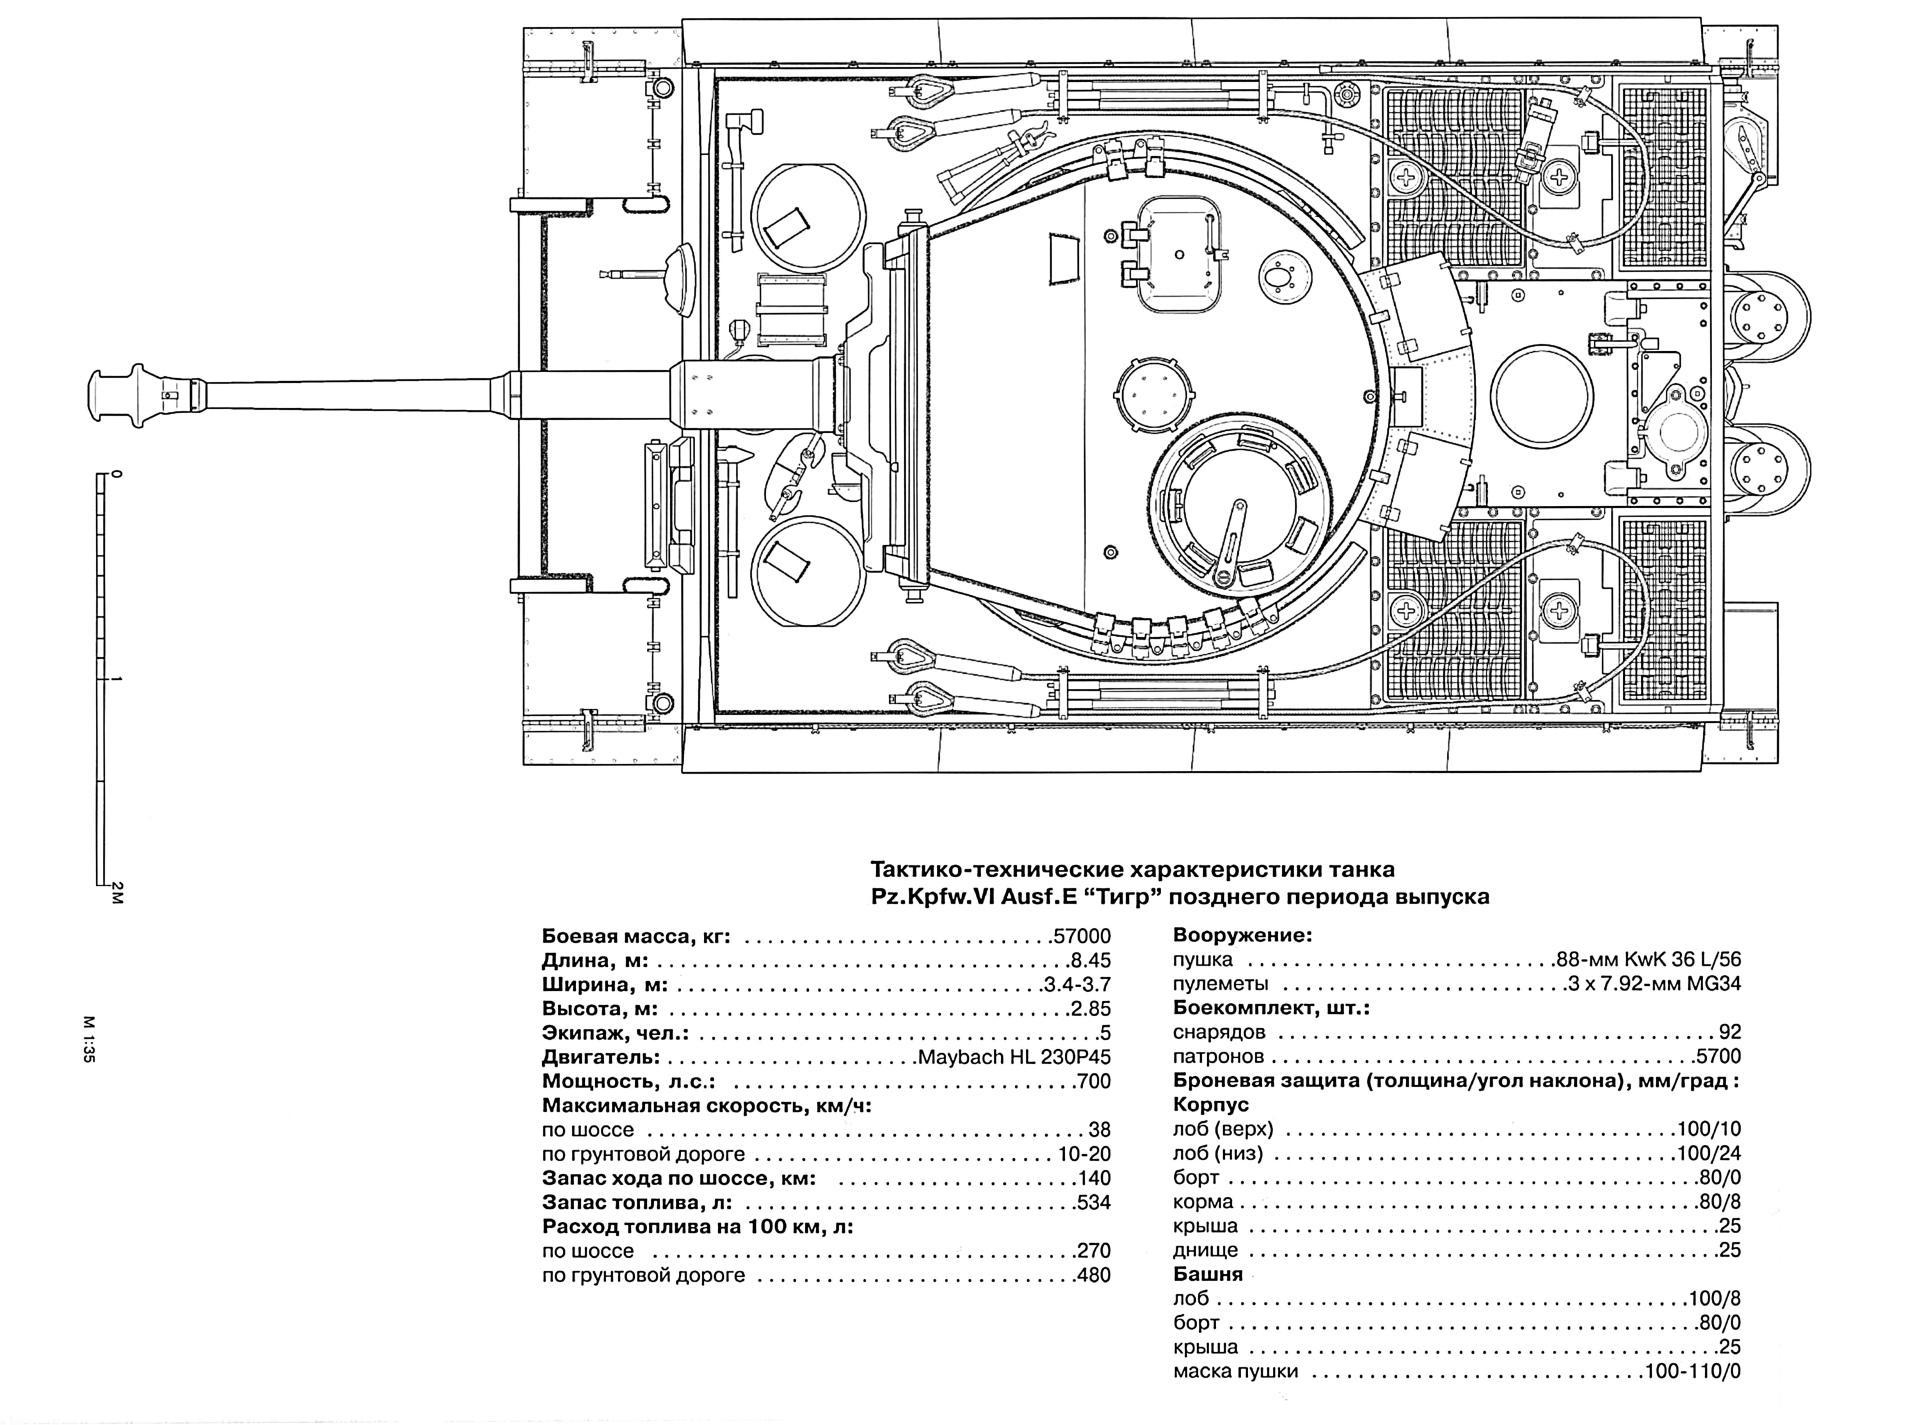 schematic wallpaper hd download